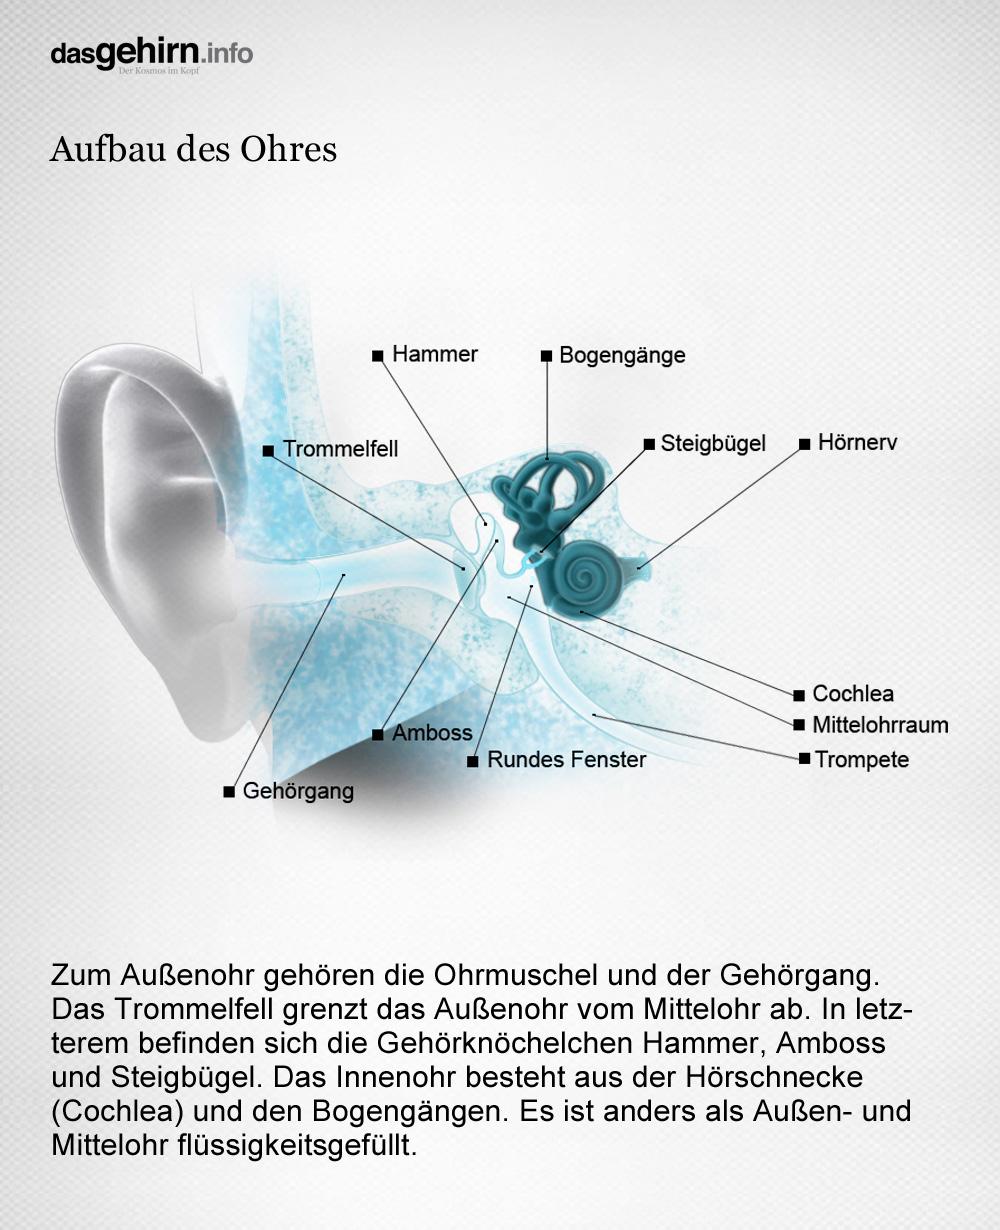 Mediathek - Bild | Hören: Aufbau des Ohres